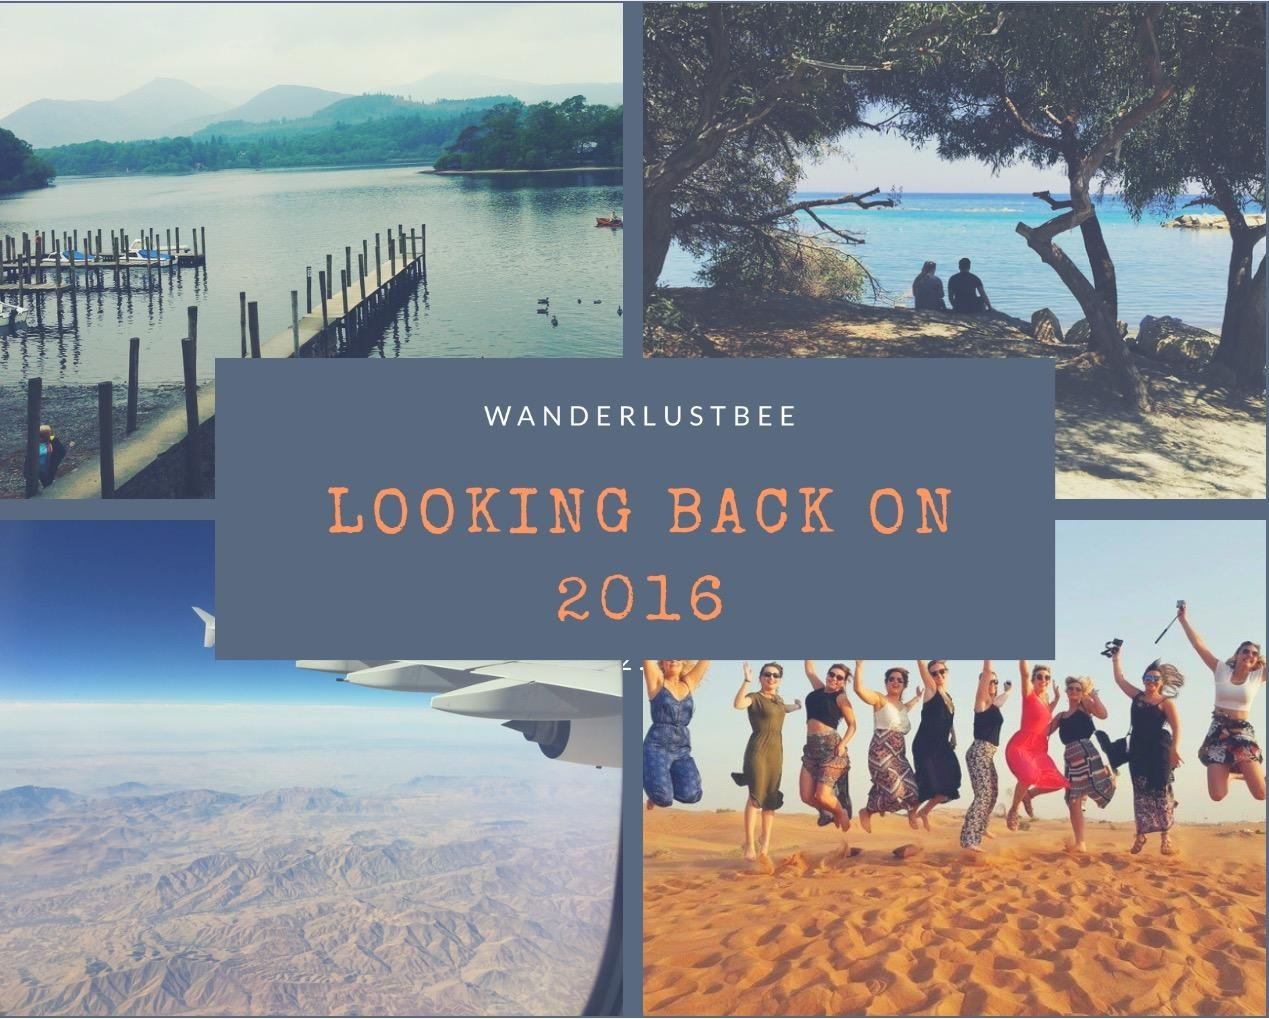 WanderlustBee | Looking Back on 2016